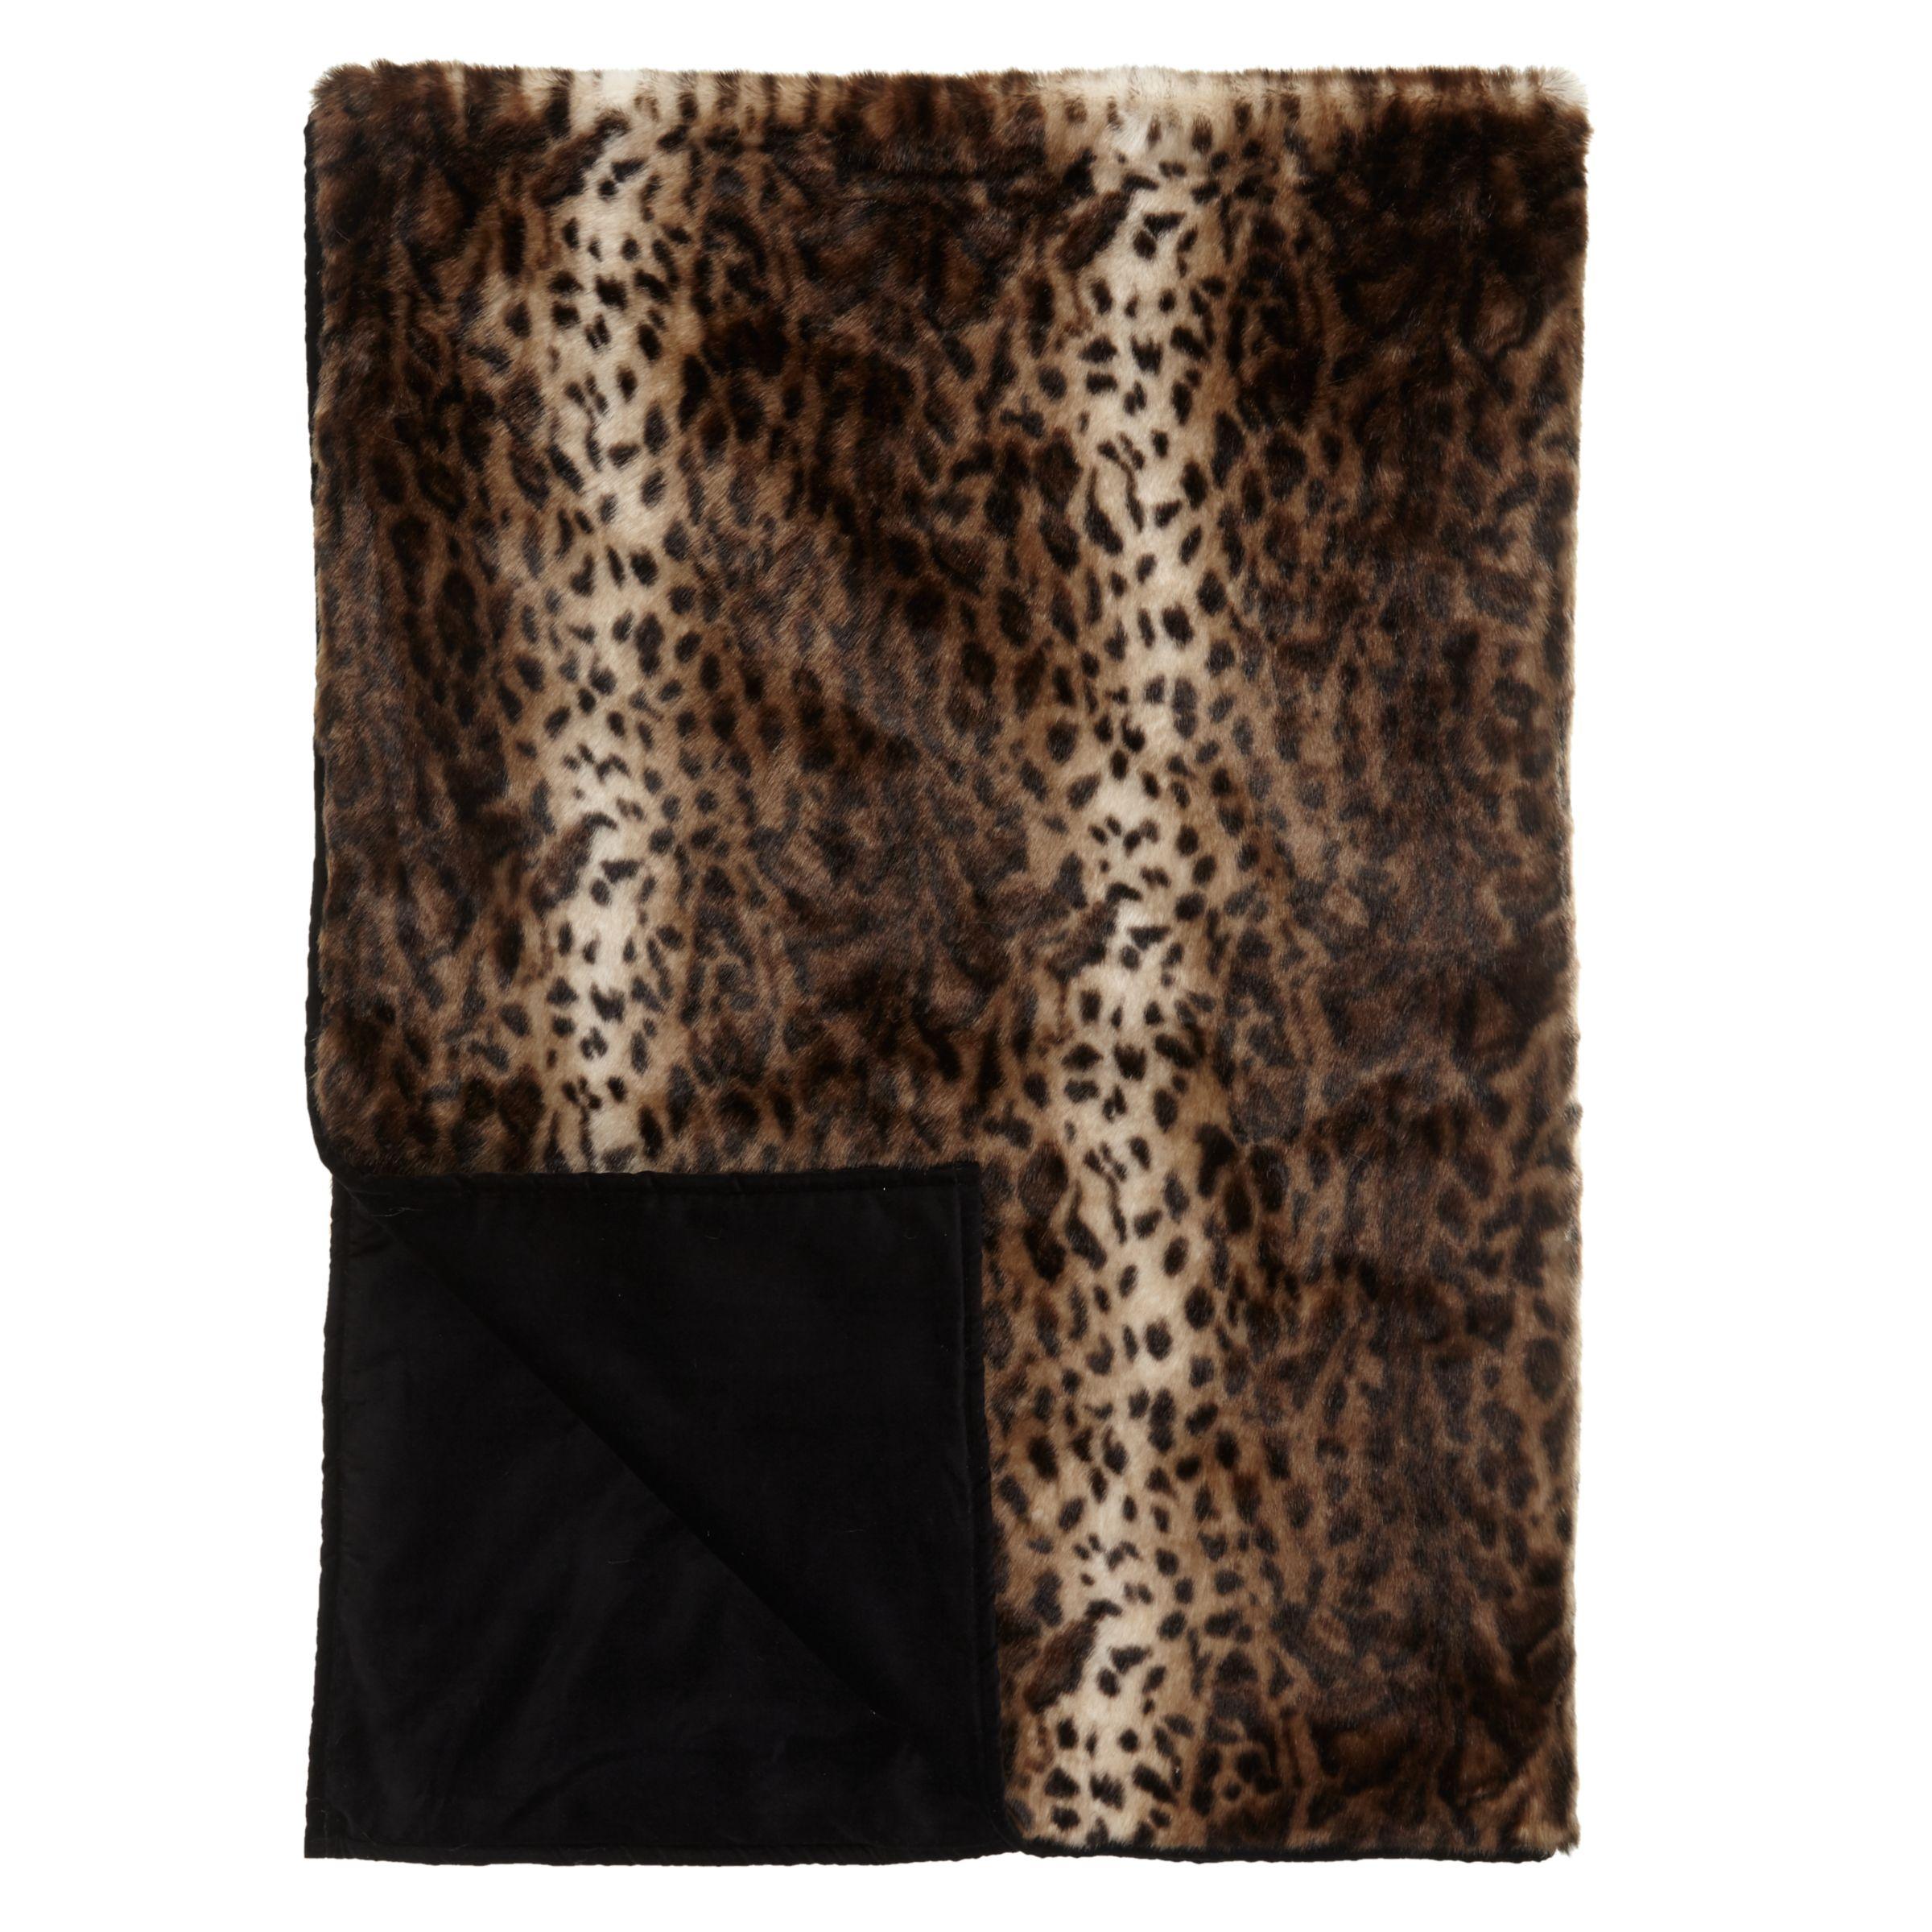 Helene Berman Helene Berman Brown Jaguar Faux Fur Throw